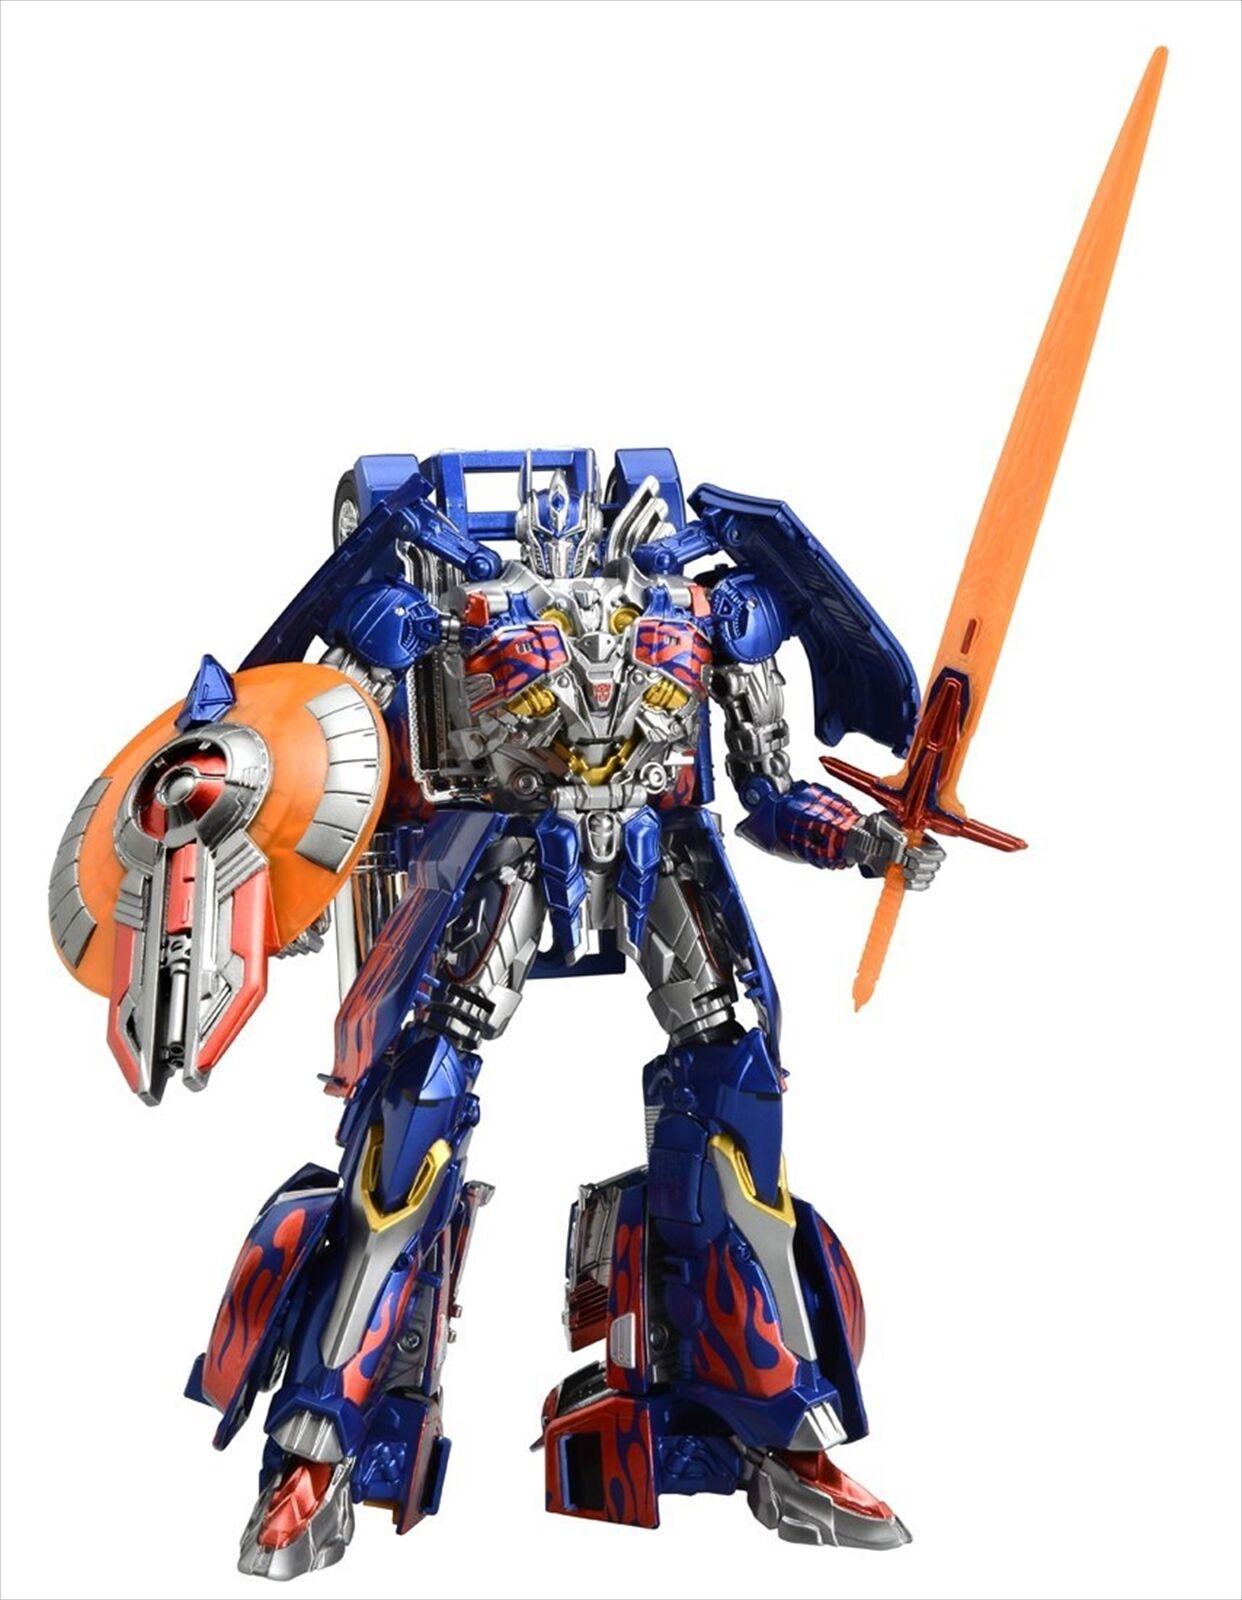 Transformers Movie Advanced Series AD31 Armor Knight Optimus Prime Figure